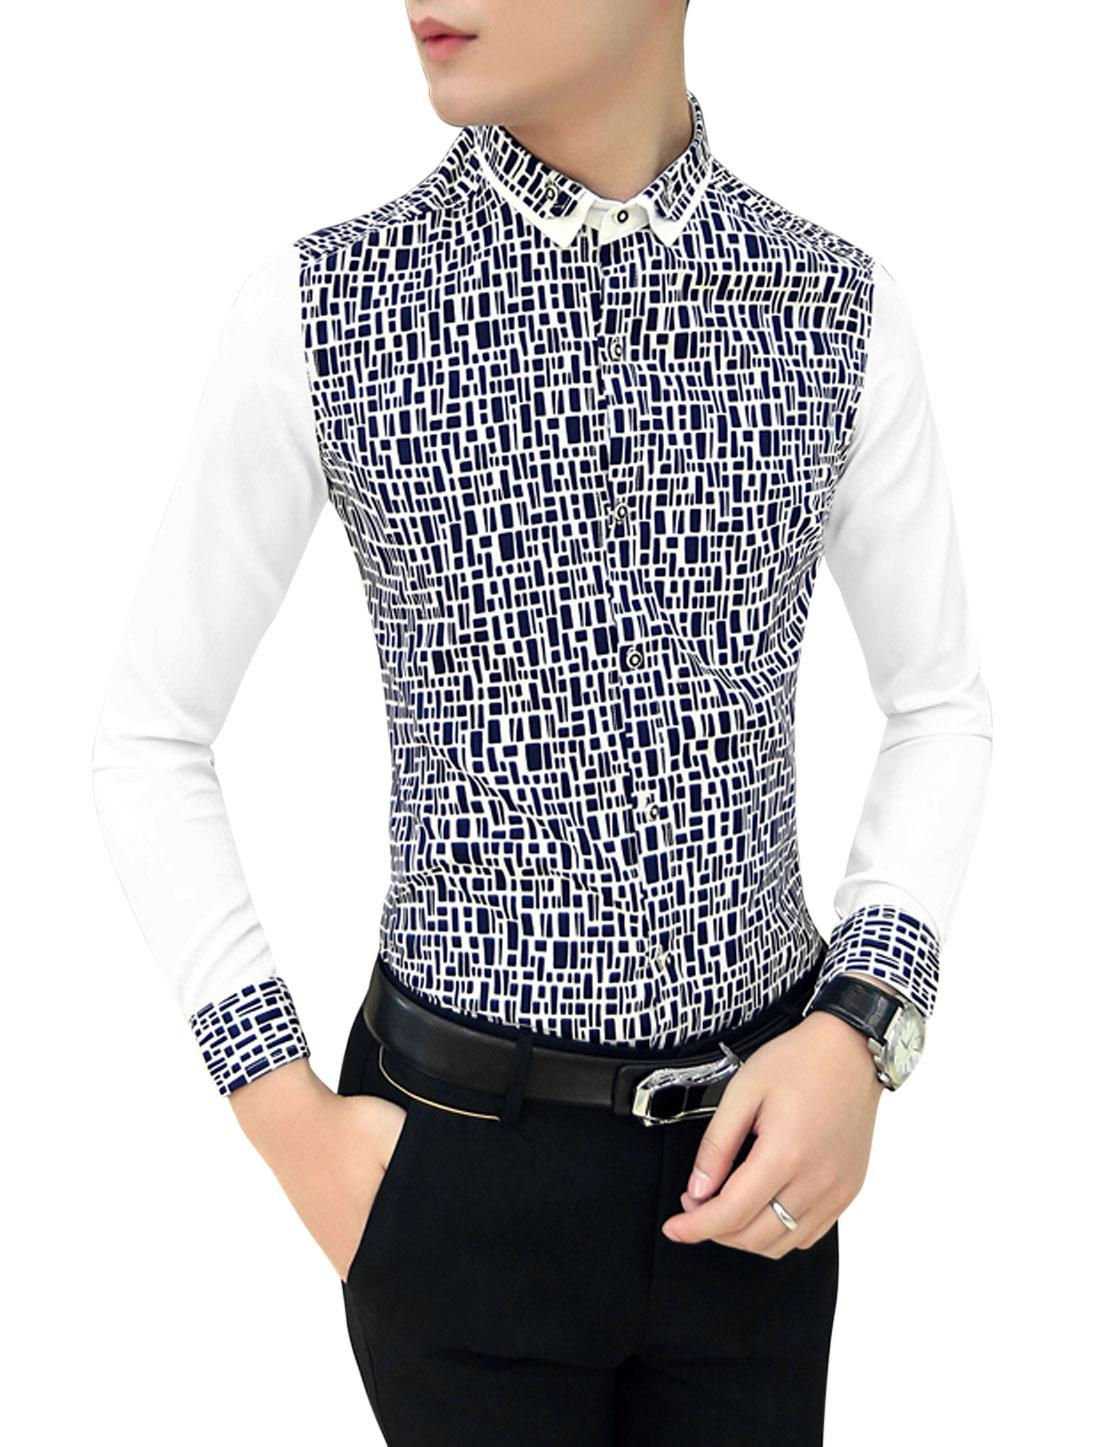 Men Contrast Long Sleeves Contrast Geometric Print Slim Cut Shirt Navy Blue White M